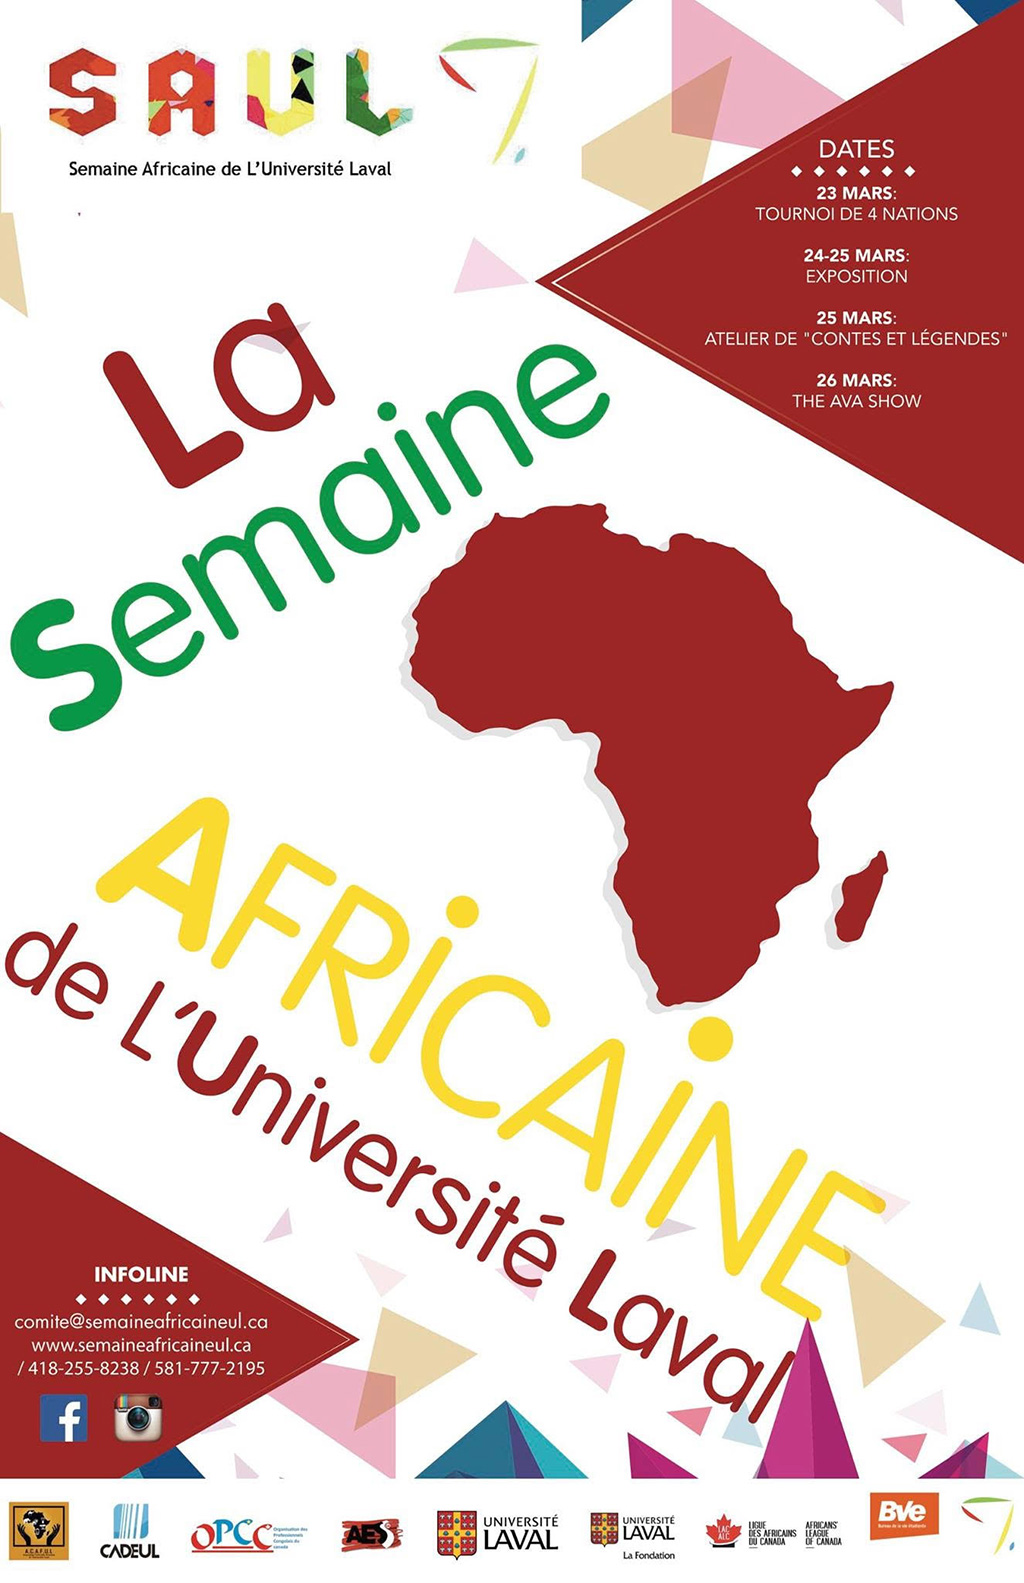 Semaine Africaine Université Laval